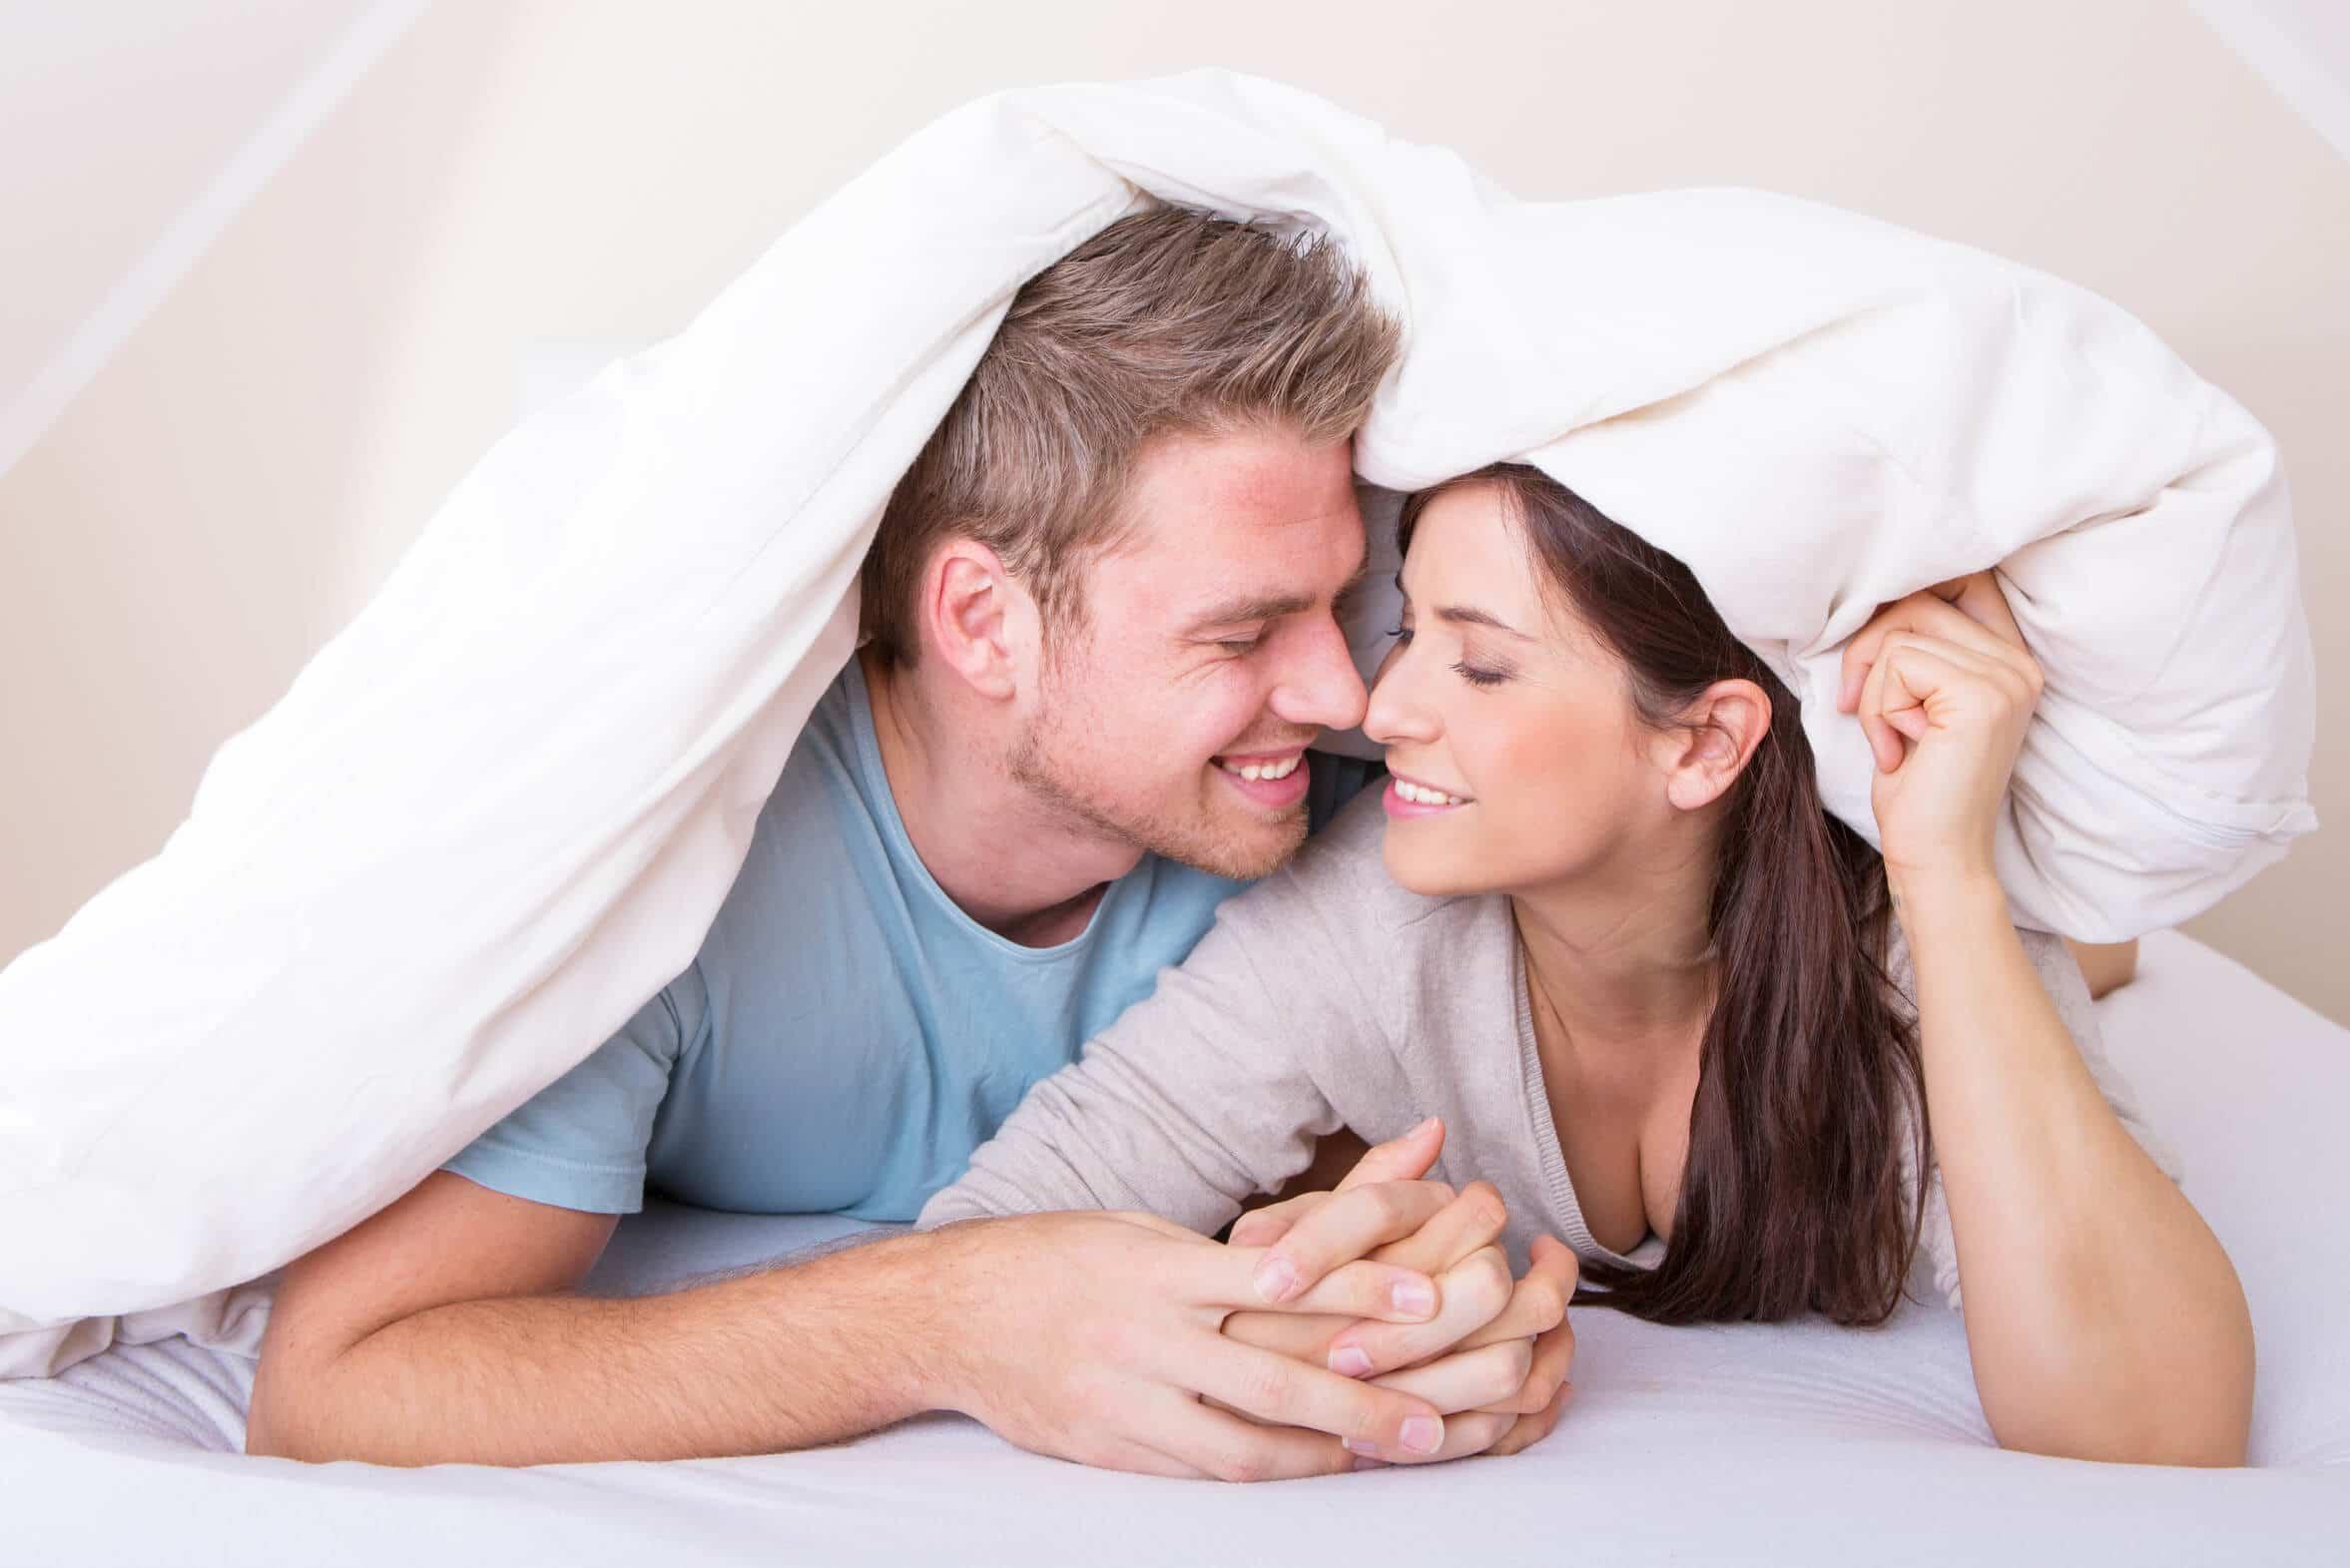 Operatia de marire a penisului - Costuri, riscuri si eficacitate – primariagircina.ro